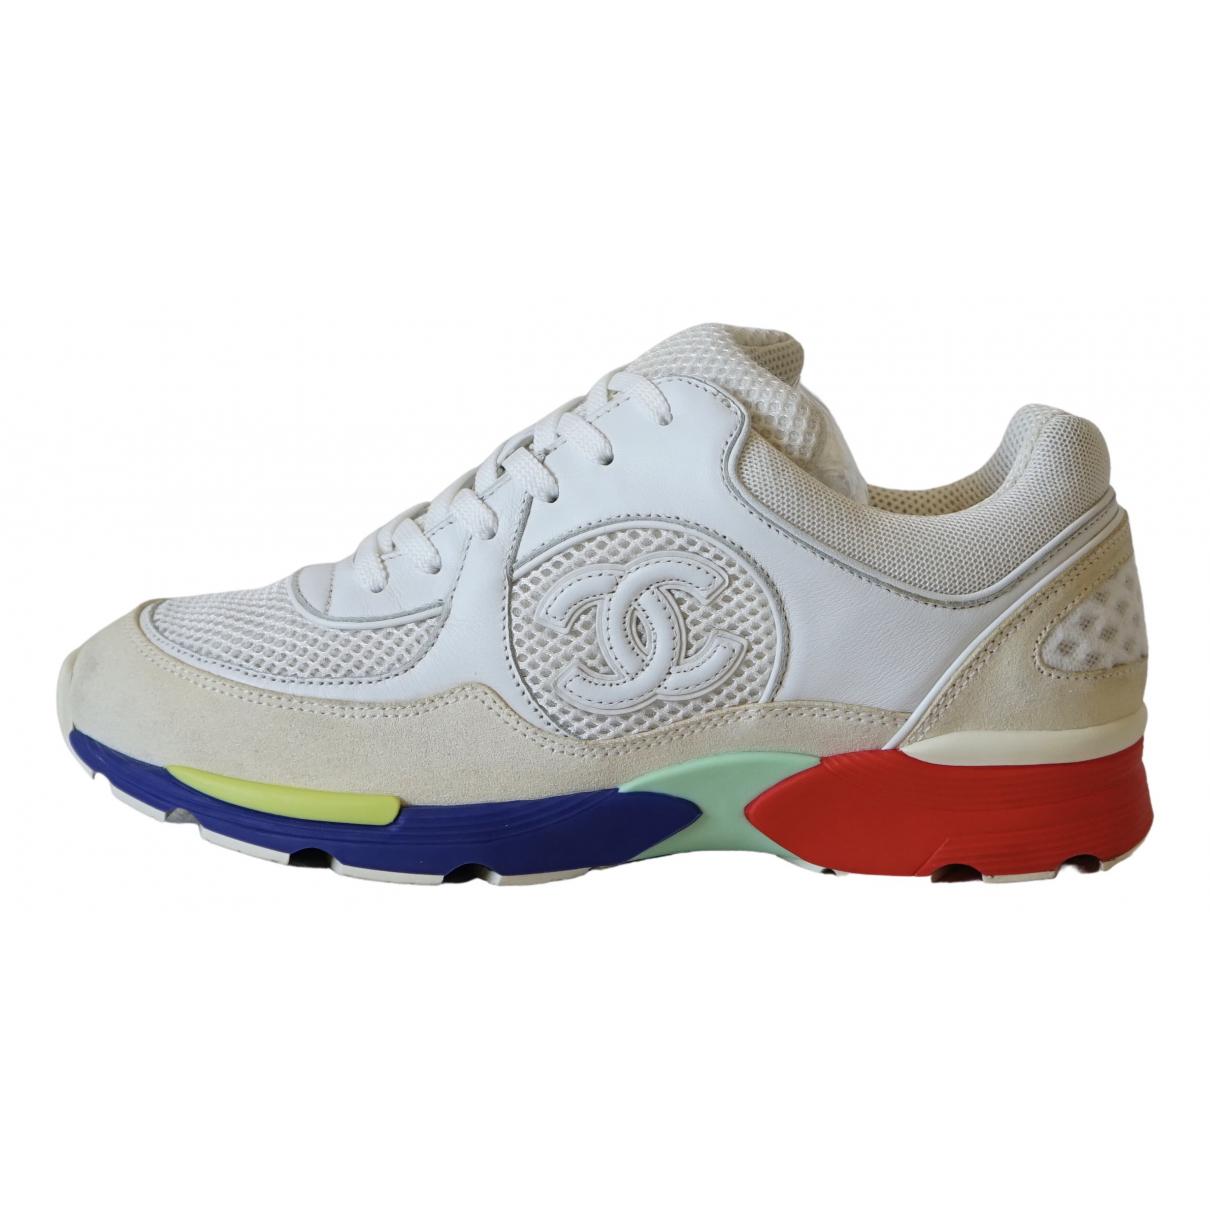 Chanel \N Sneakers in  Bunt Leinen